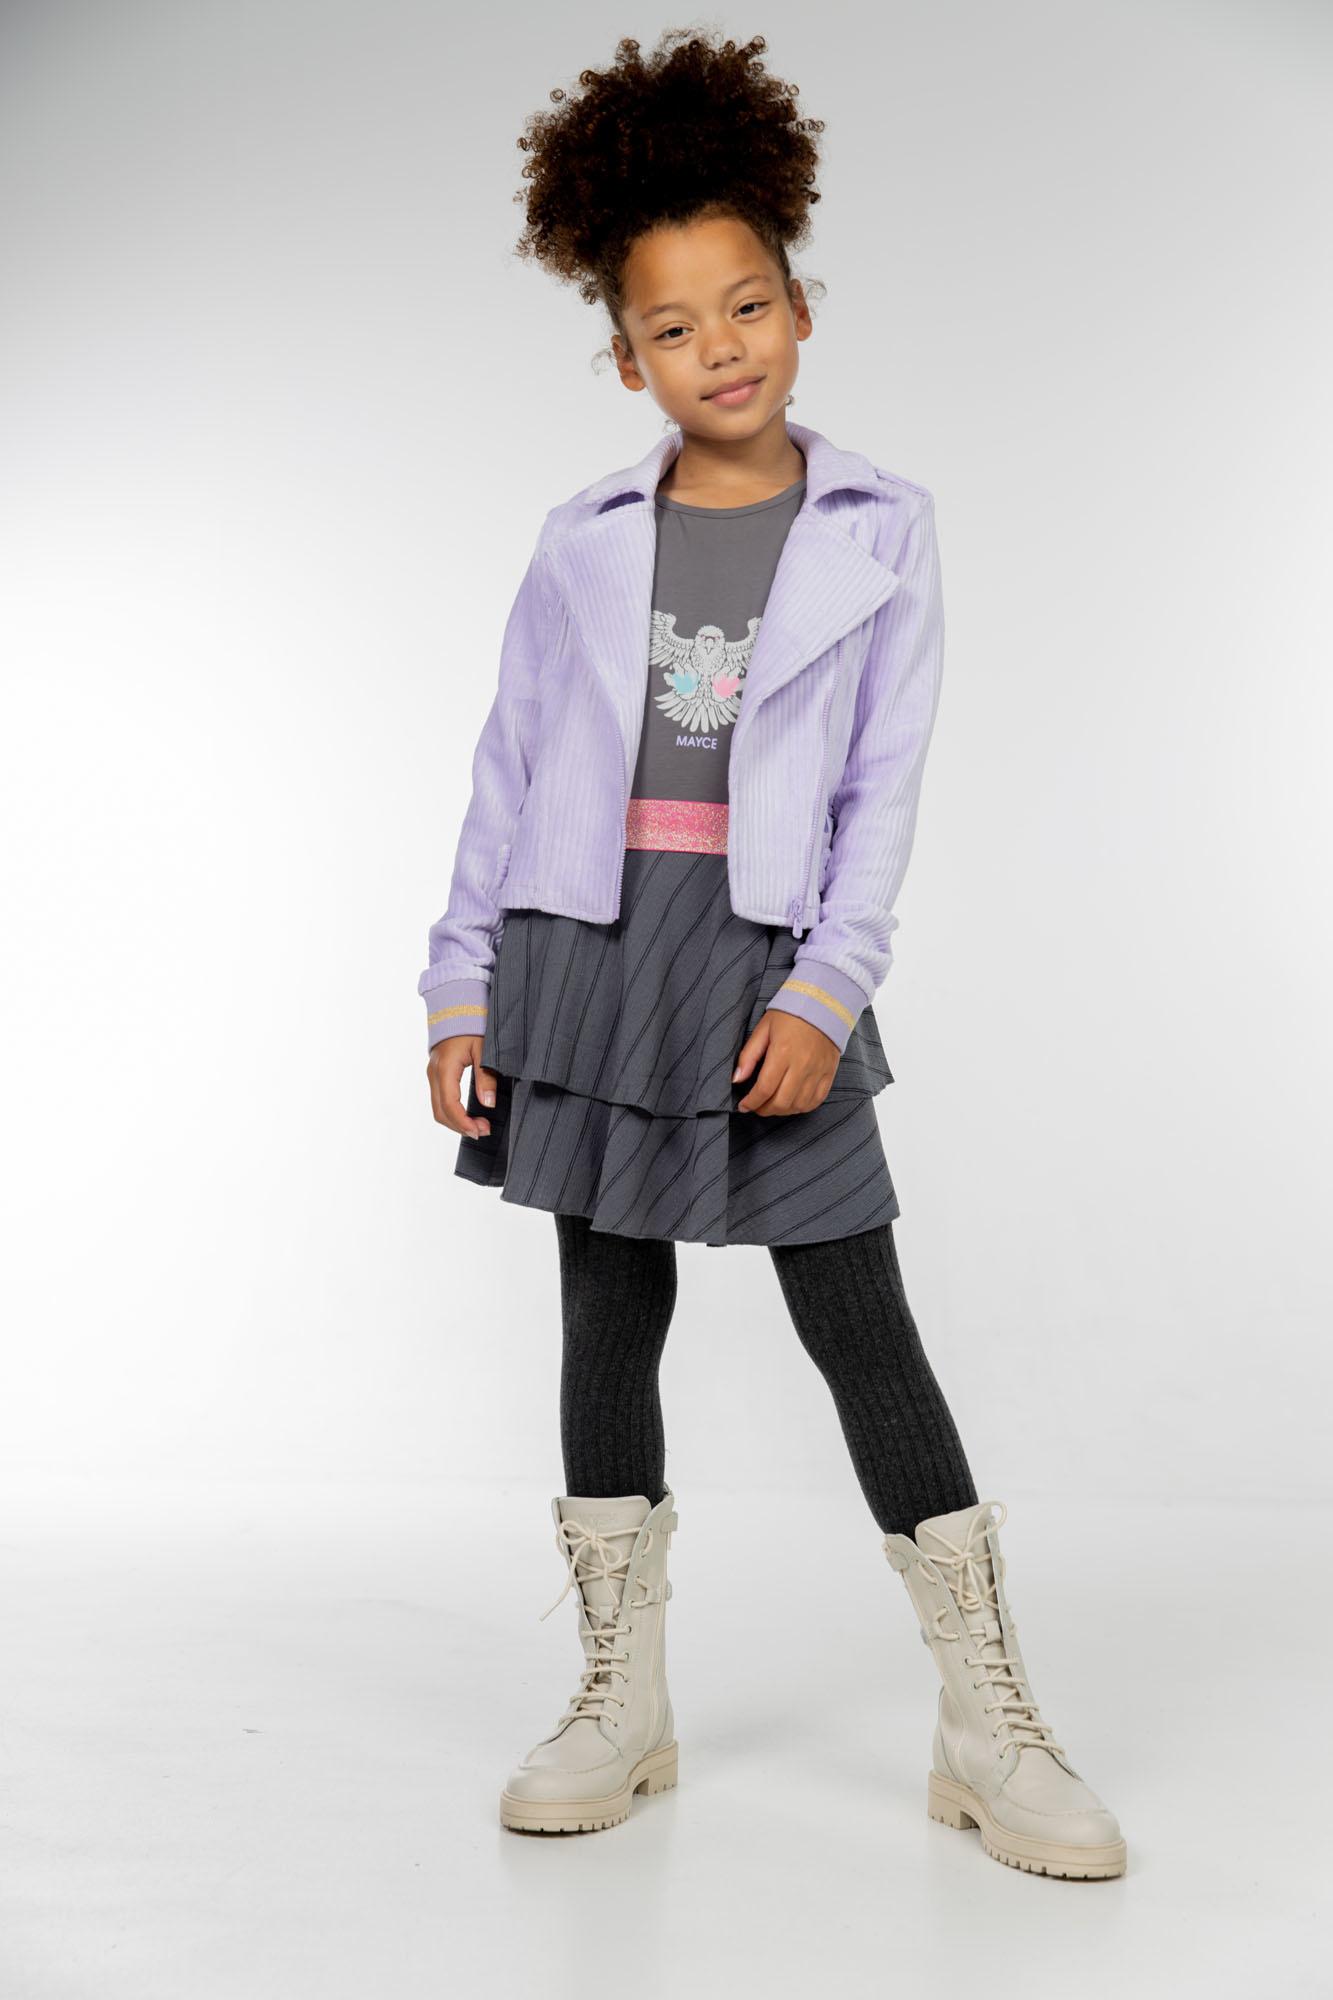 Mayce Girlslabel lookbook winter 2022-80